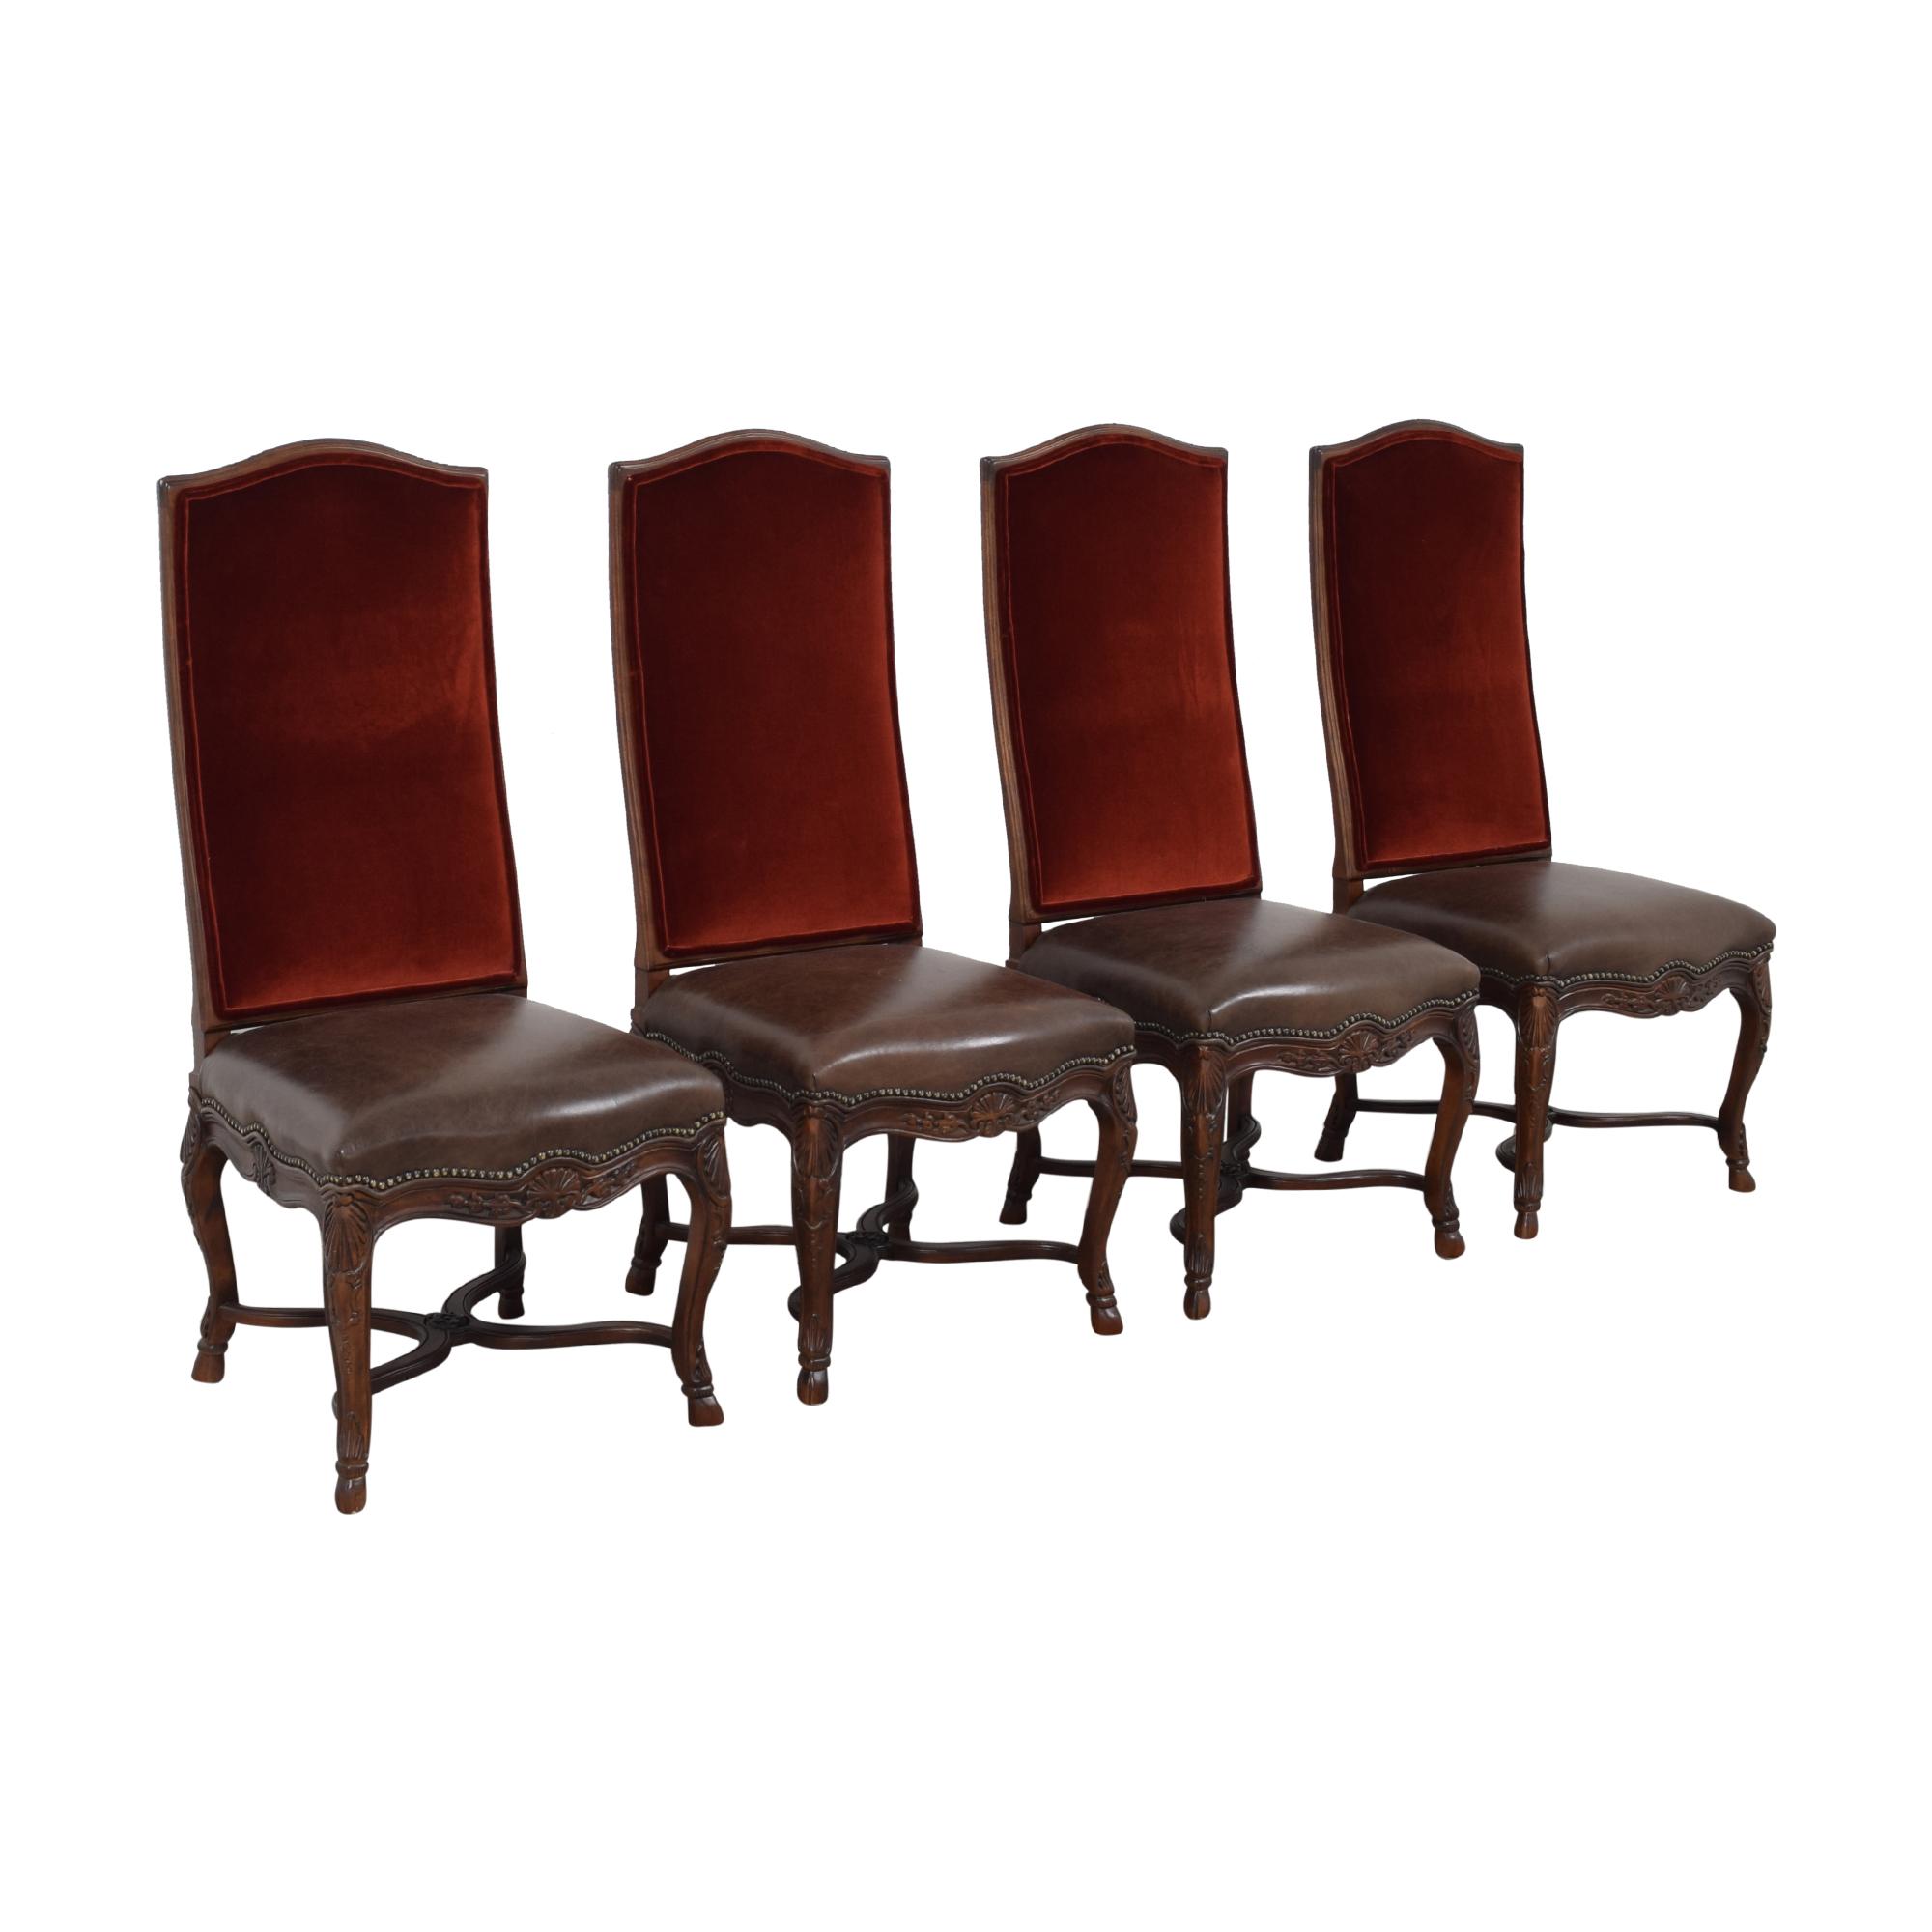 Safavieh Safavieh High Back Formal Dining Chairs ma